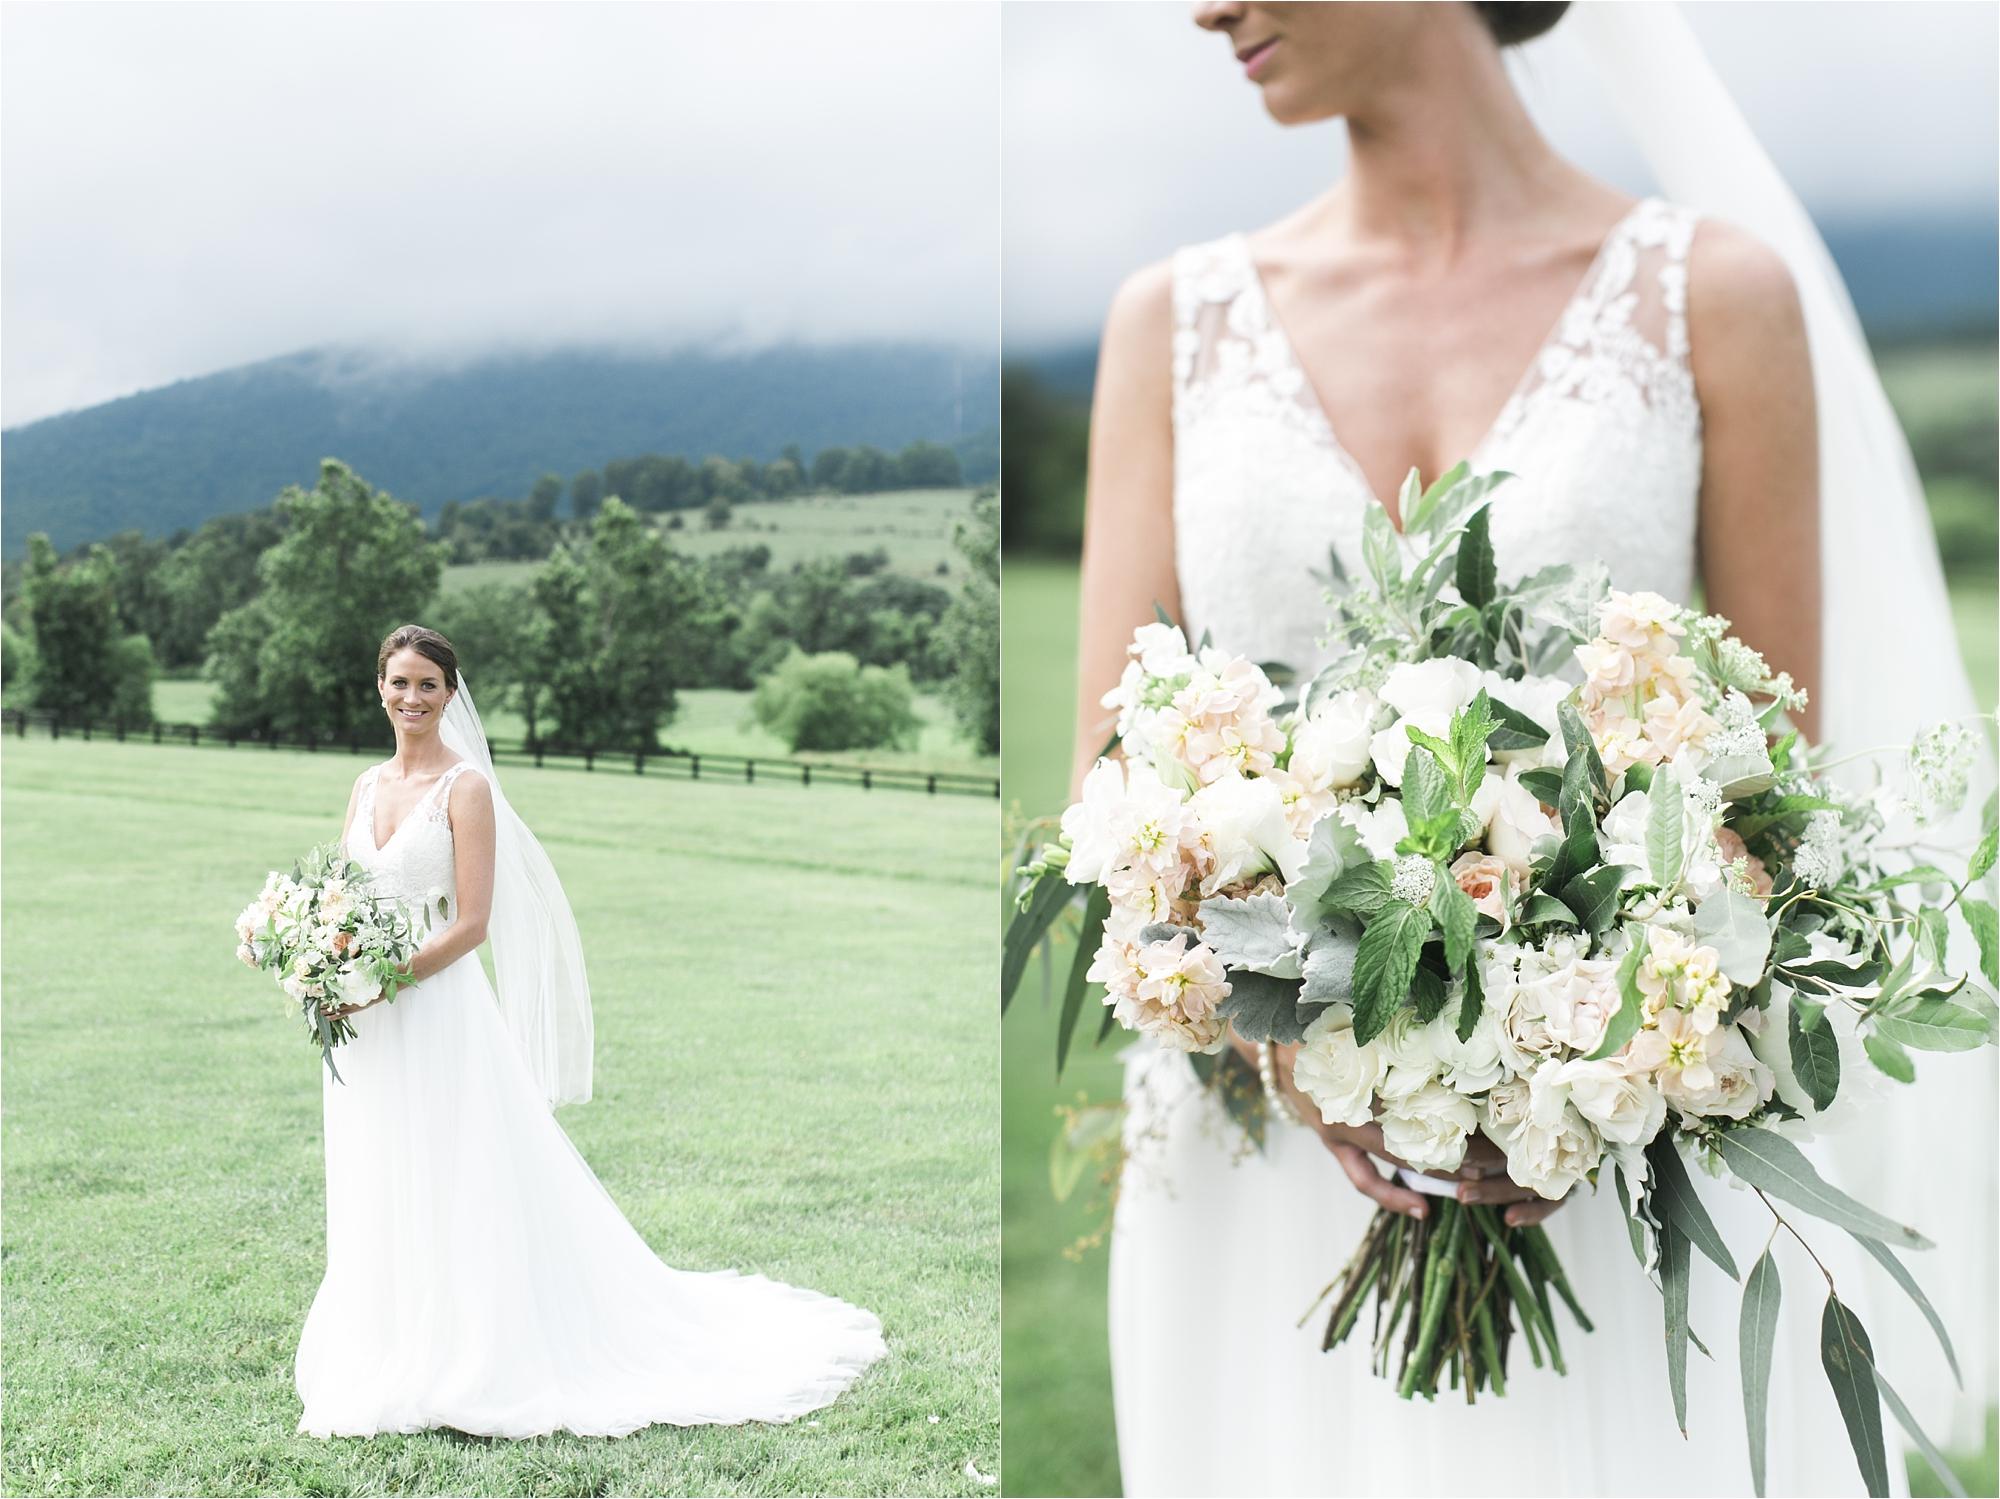 stephanie-yonce-charlottesville-virginia-king-family-vineyard-wedding-photos_0010.jpg